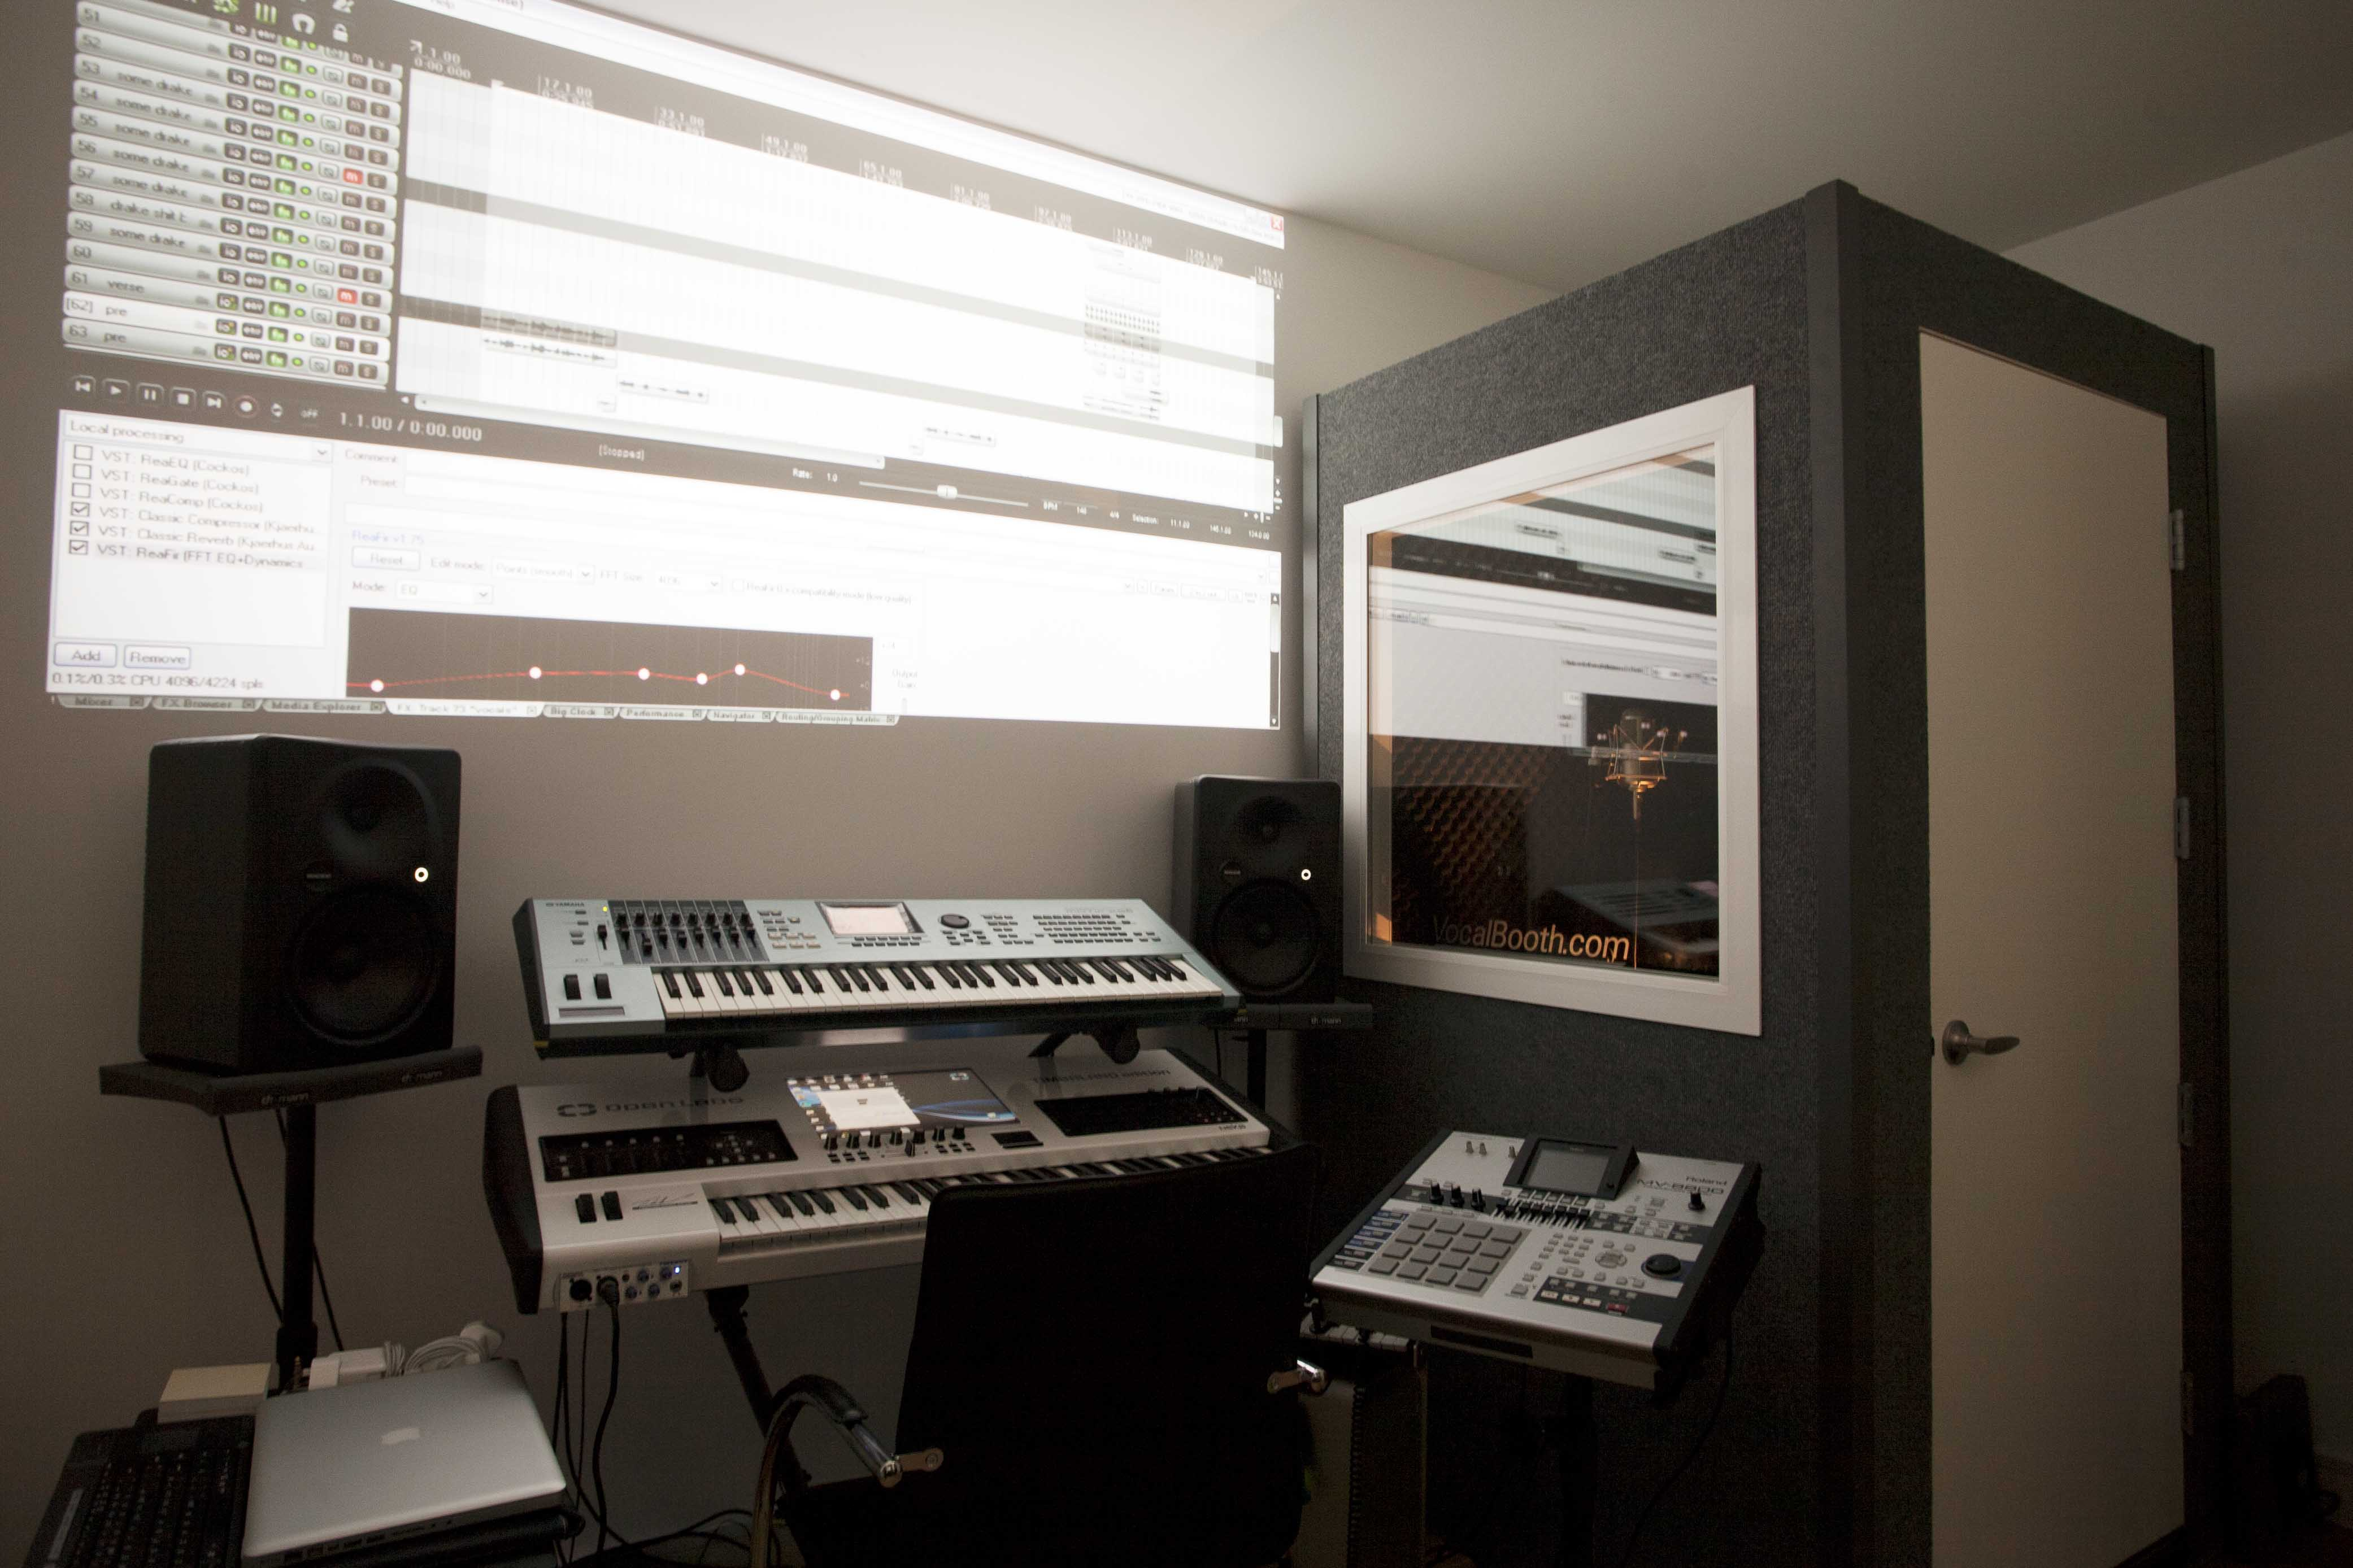 Domestic Recording Studio Room Within A